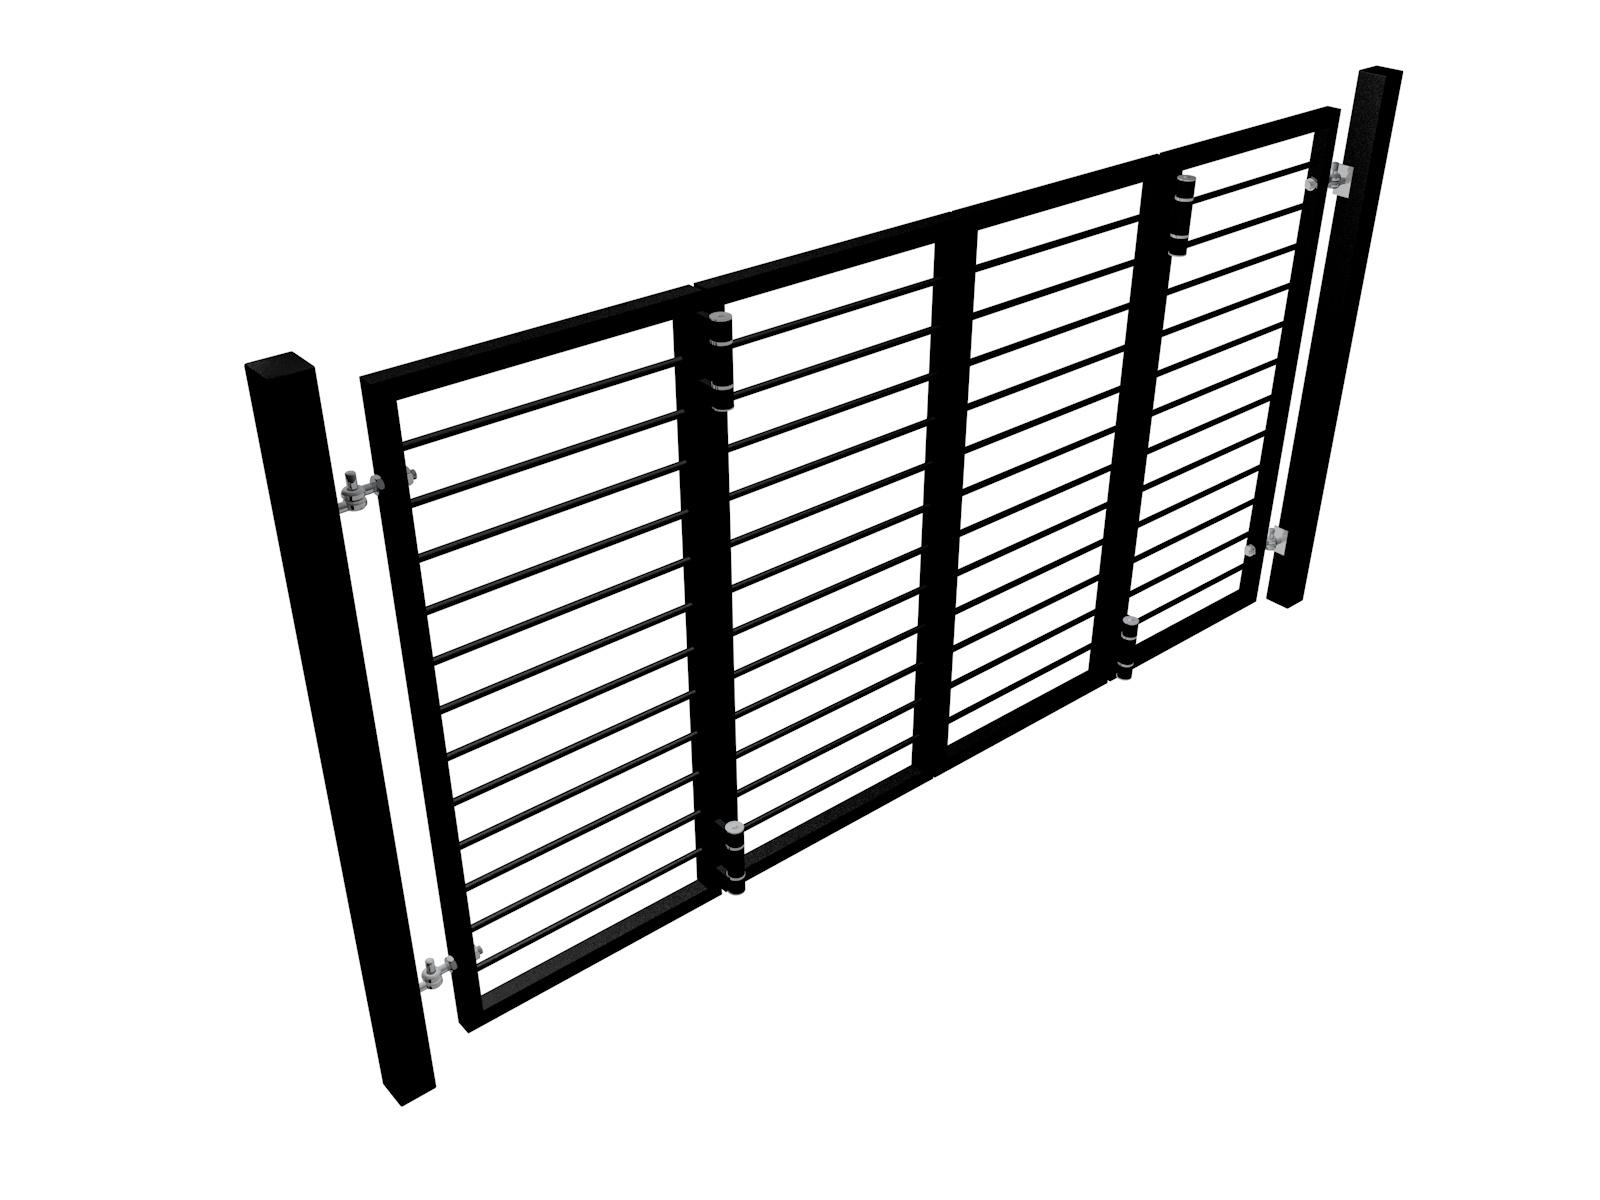 bi-fold automated metal gate with horizontal round bars